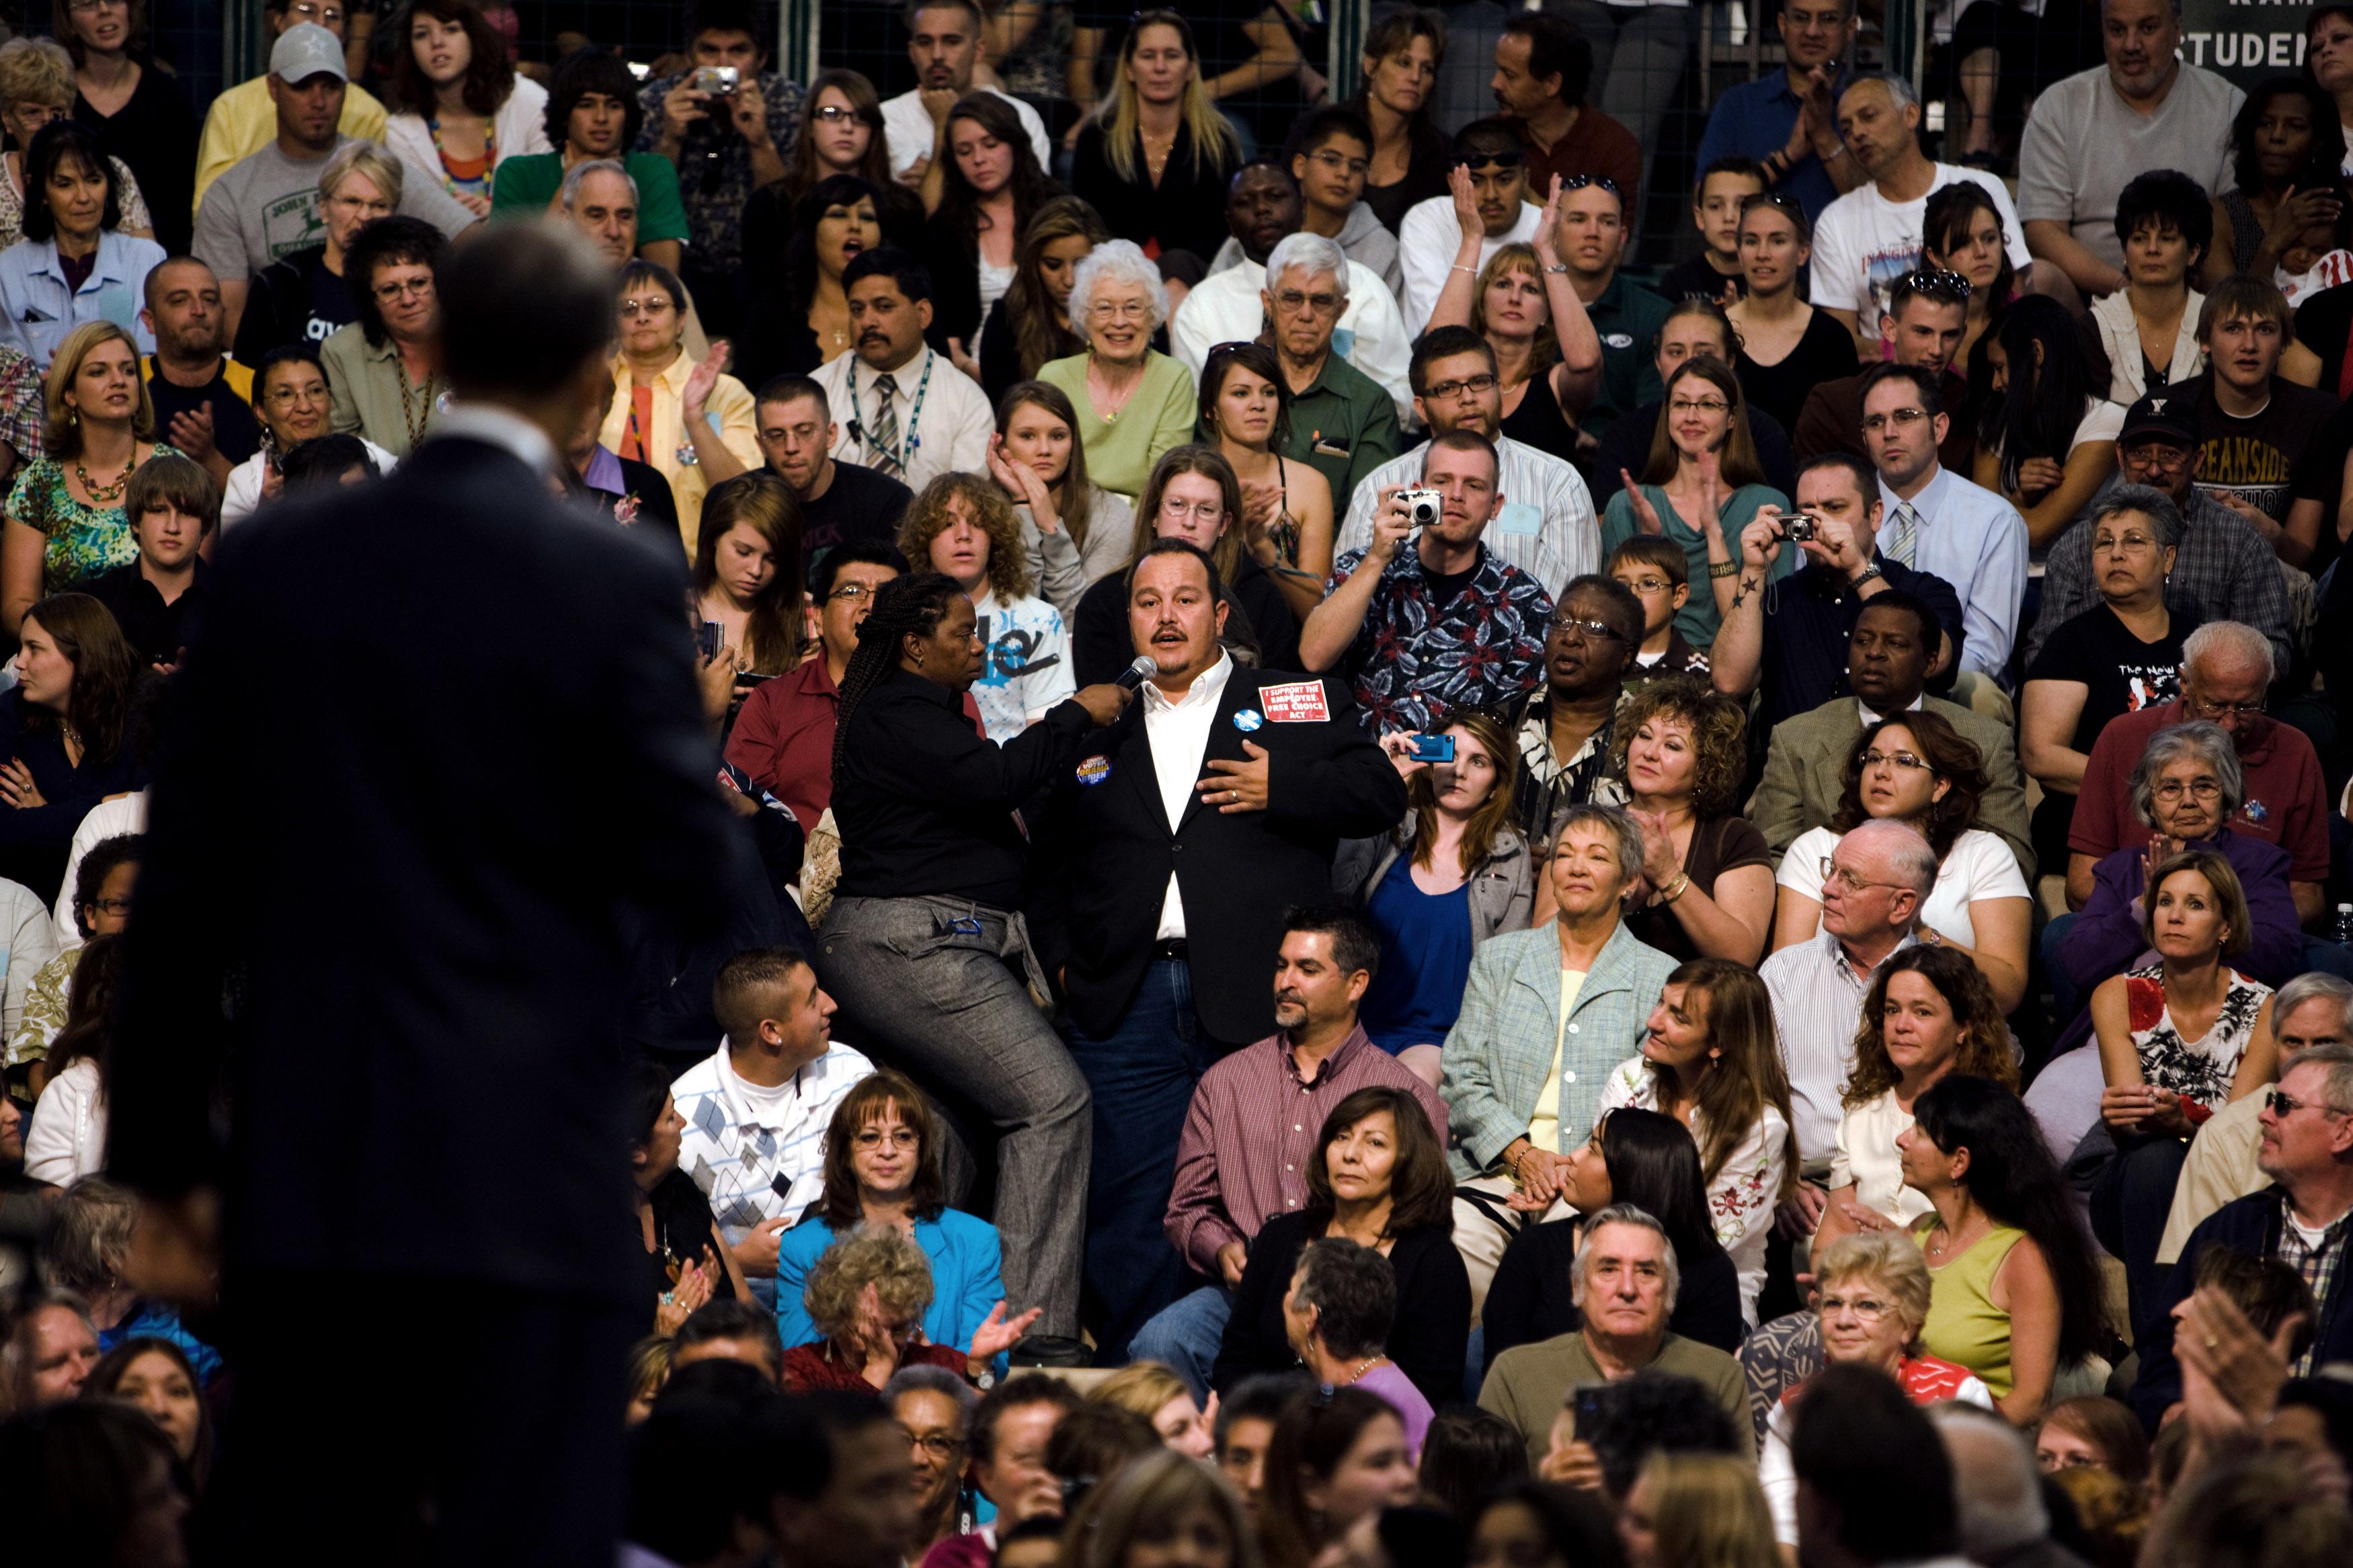 Crowd clipart public Free Speaking Obama Barack